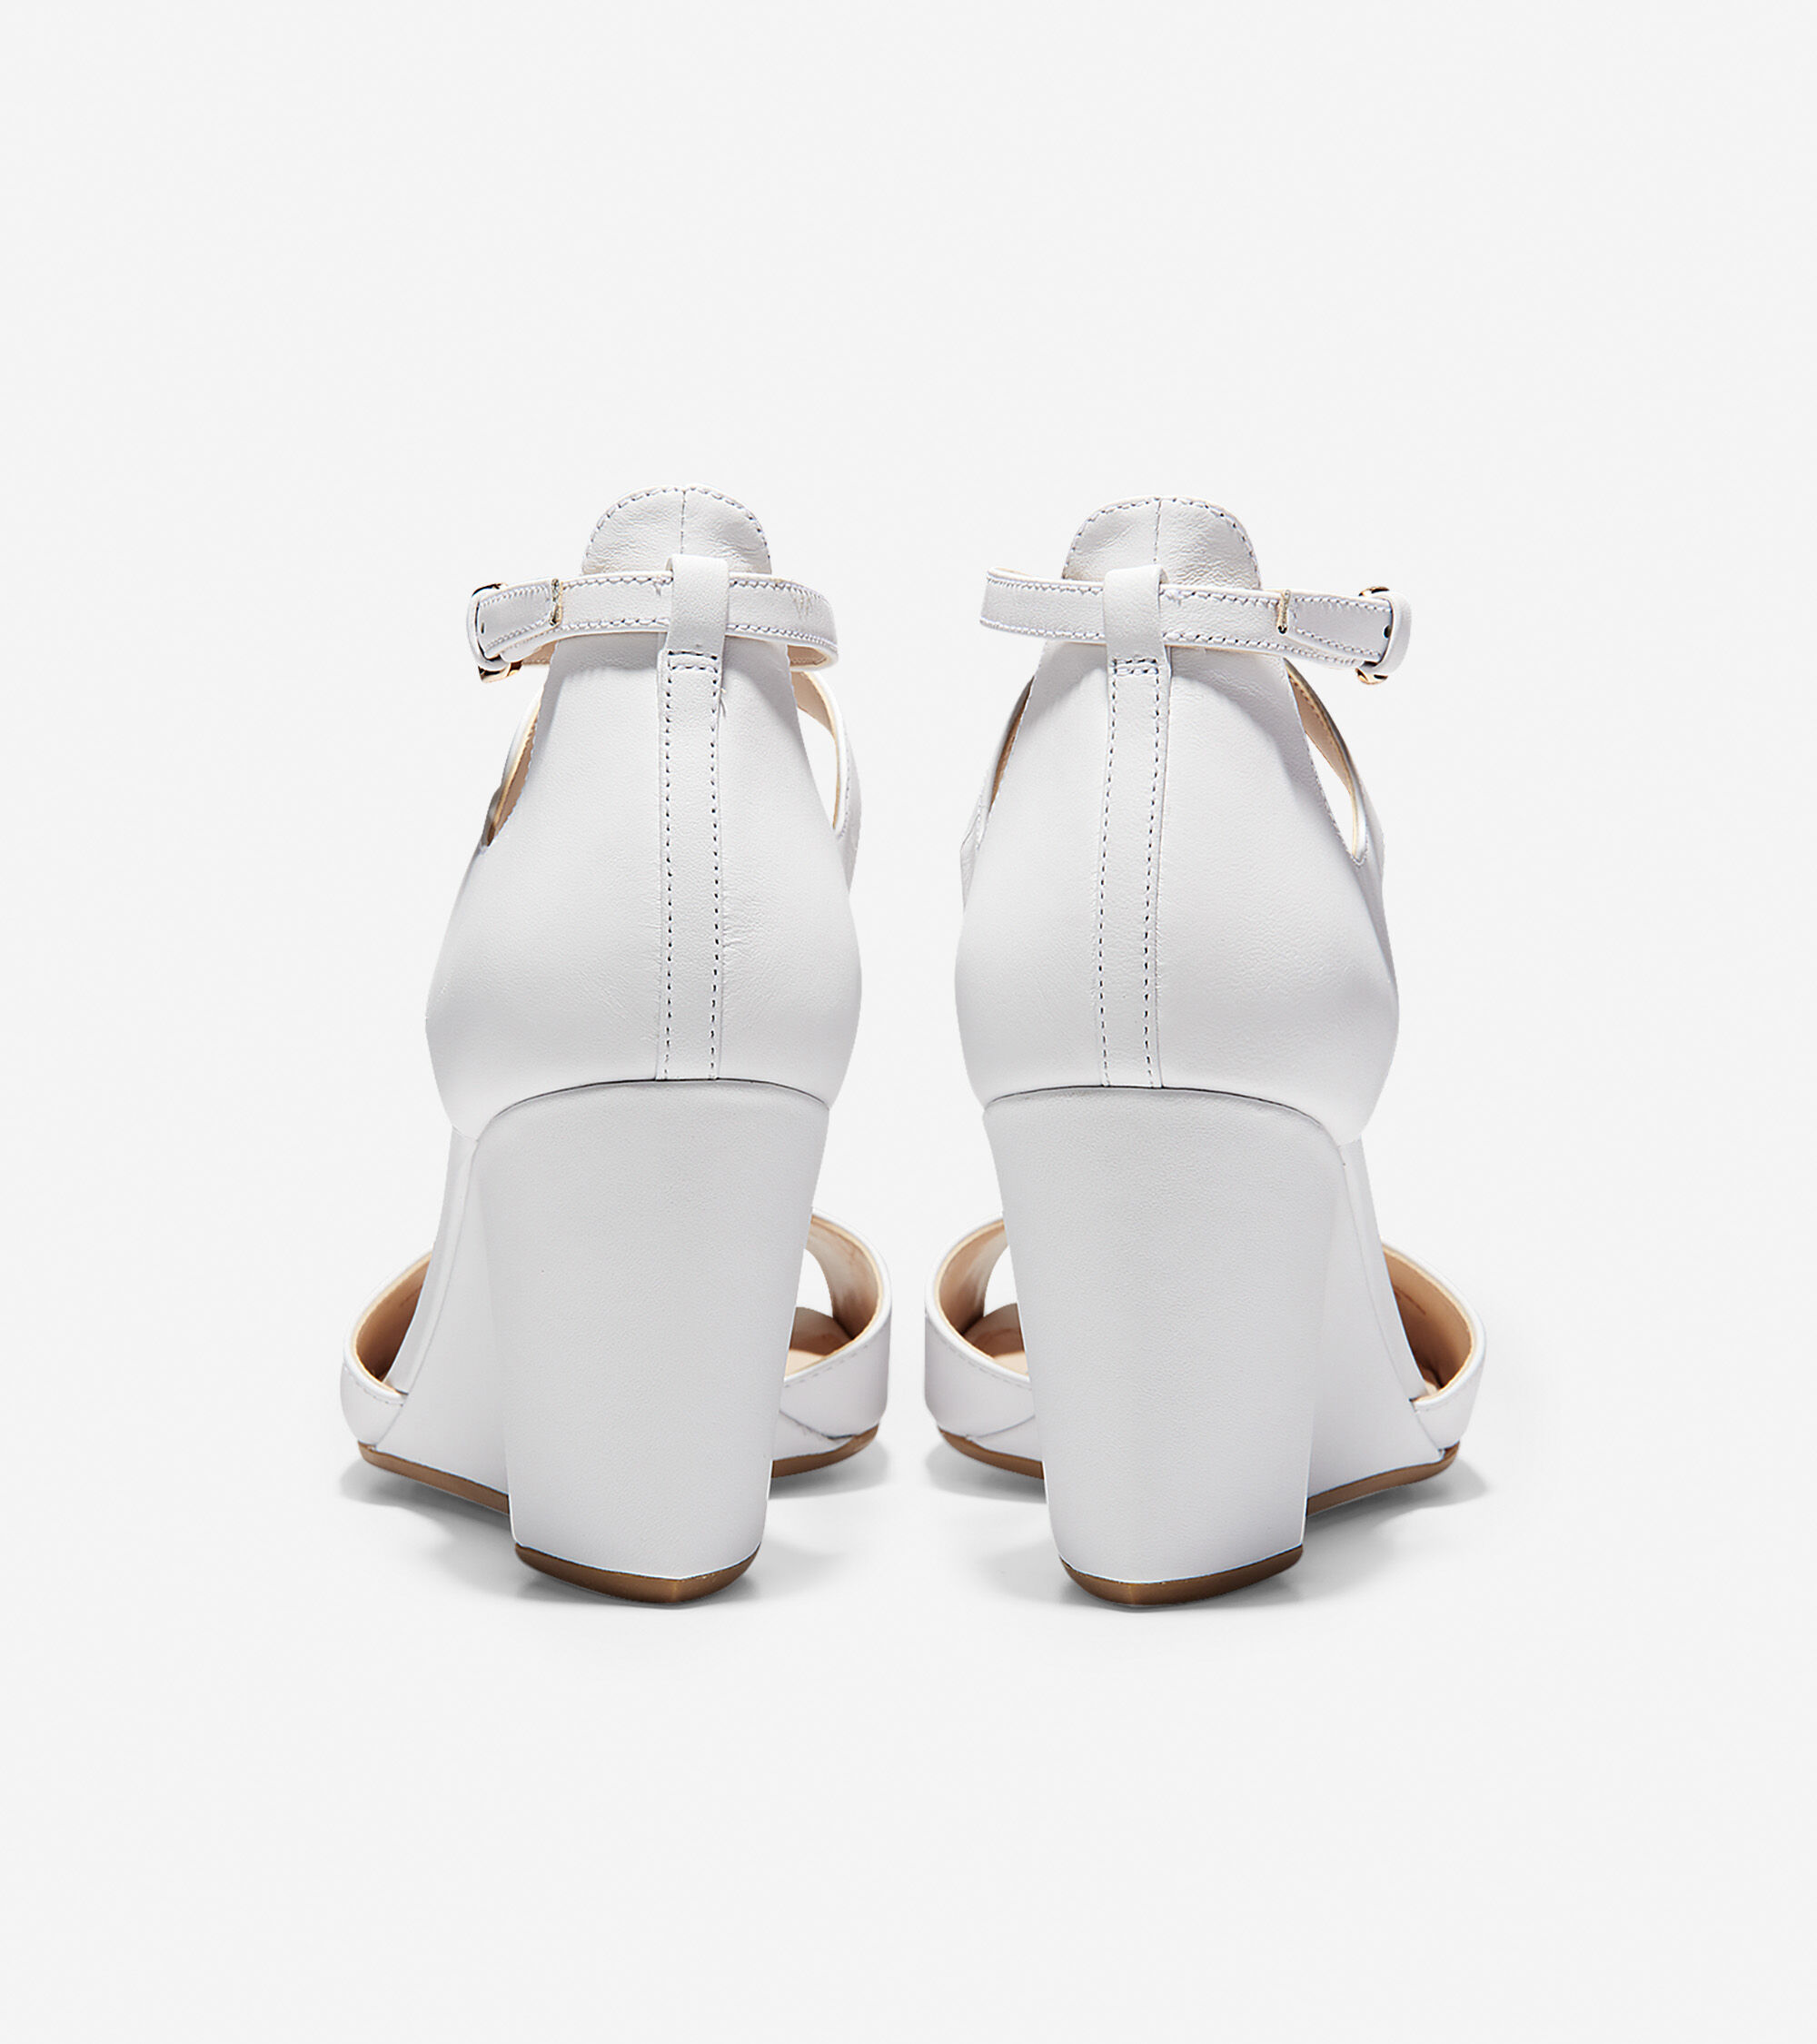 1f83cd201a5 Women s Sadie Open Toe Wedge Sandals 75MM in Optic White